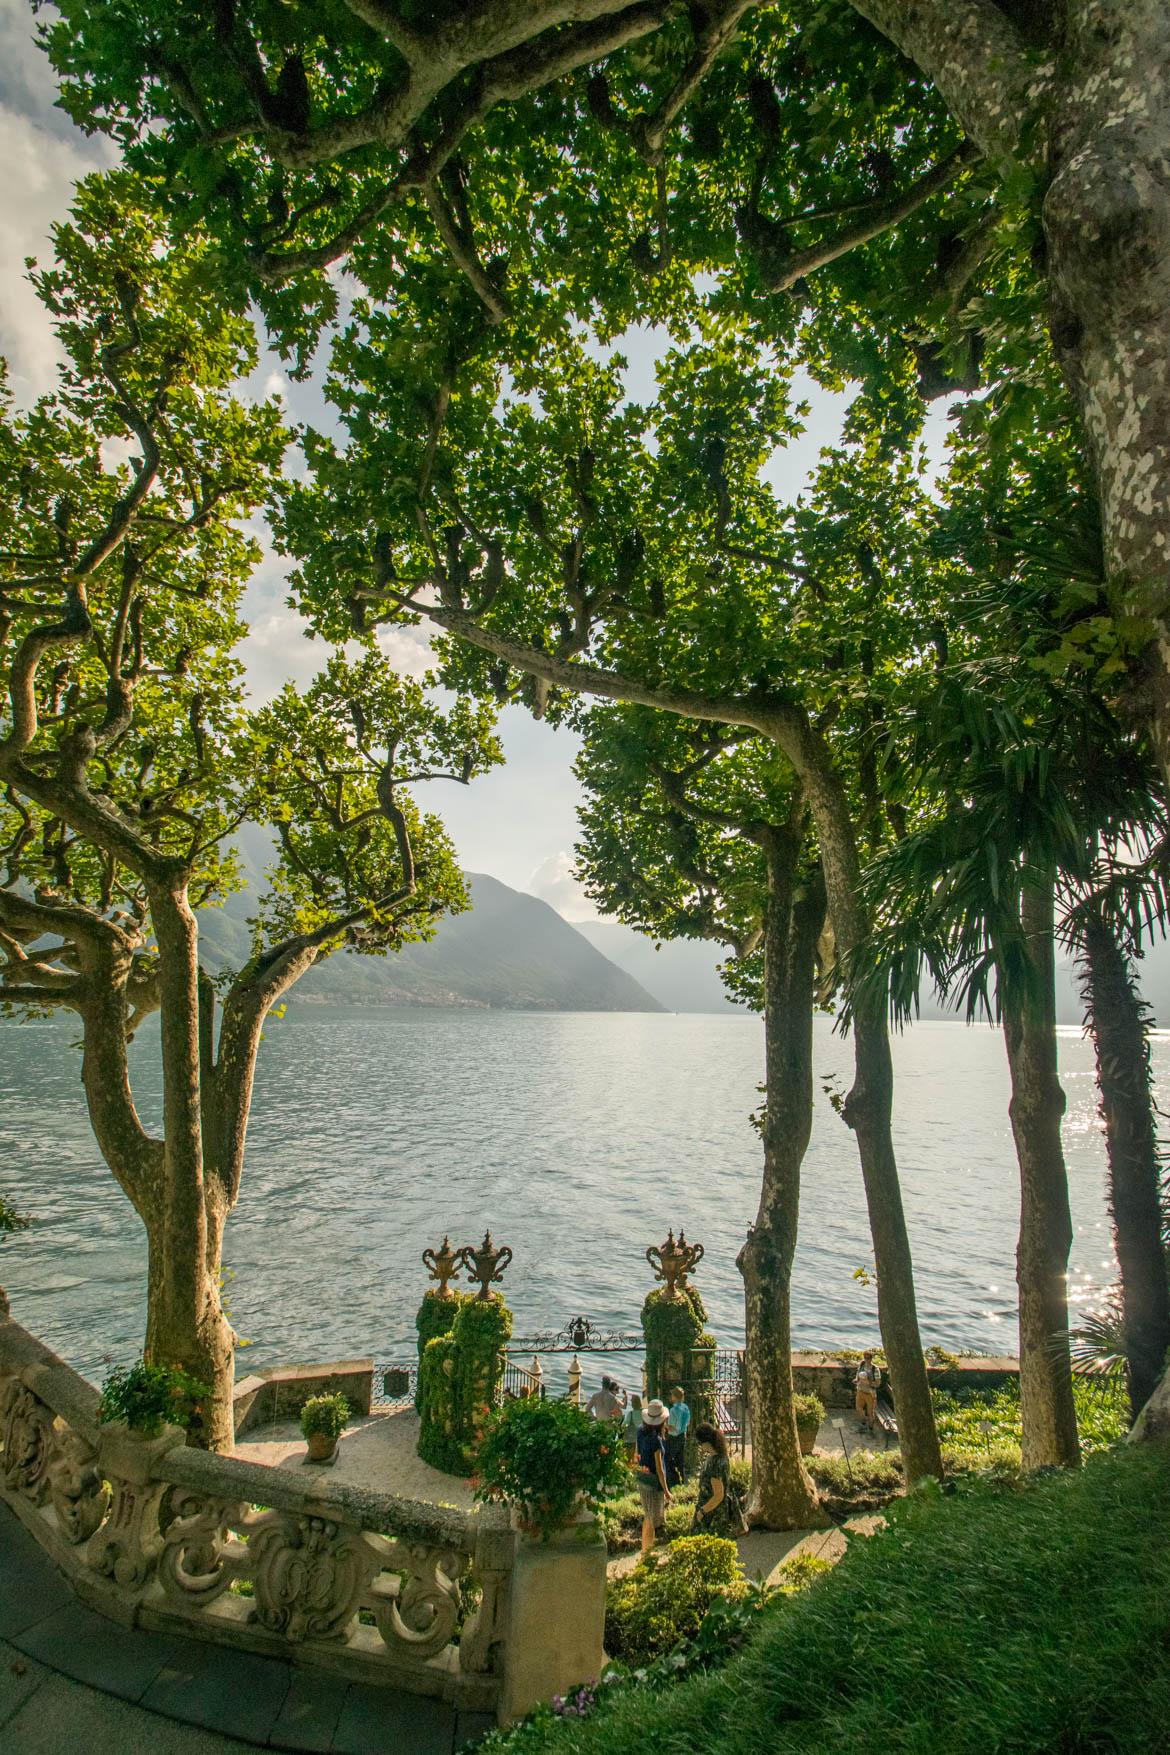 Lac de Côme - Villa Balbianello